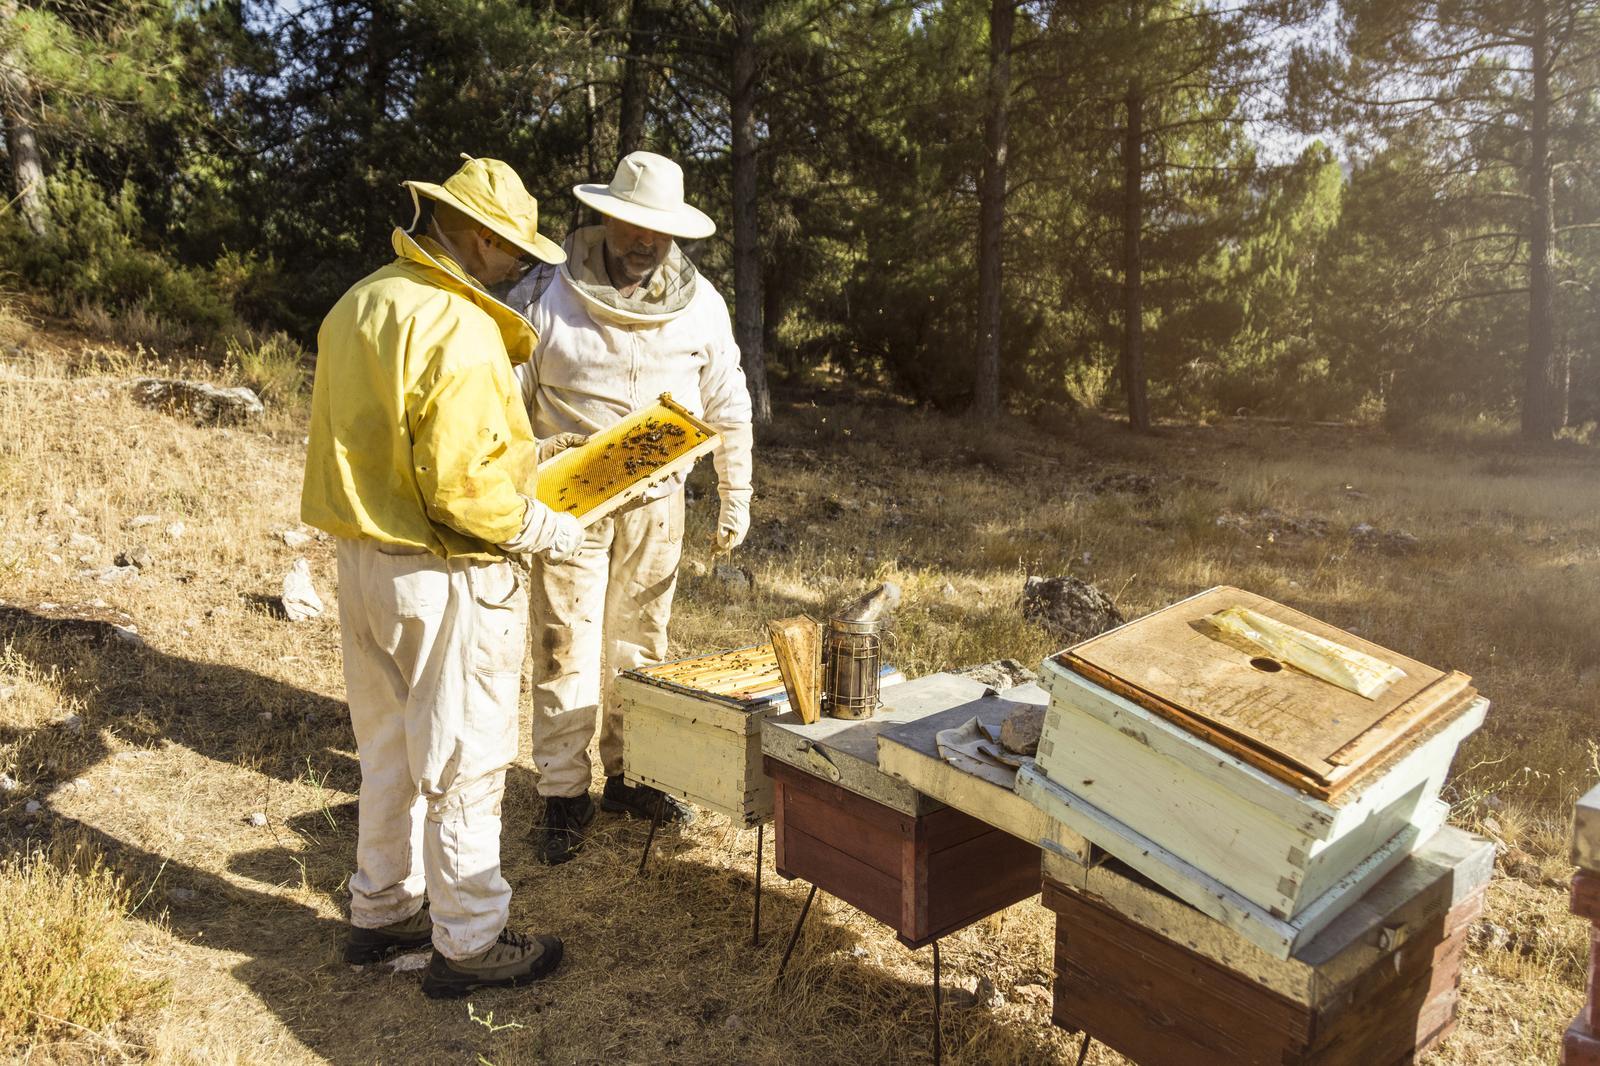 Bee keeping in Lääne-Viru county